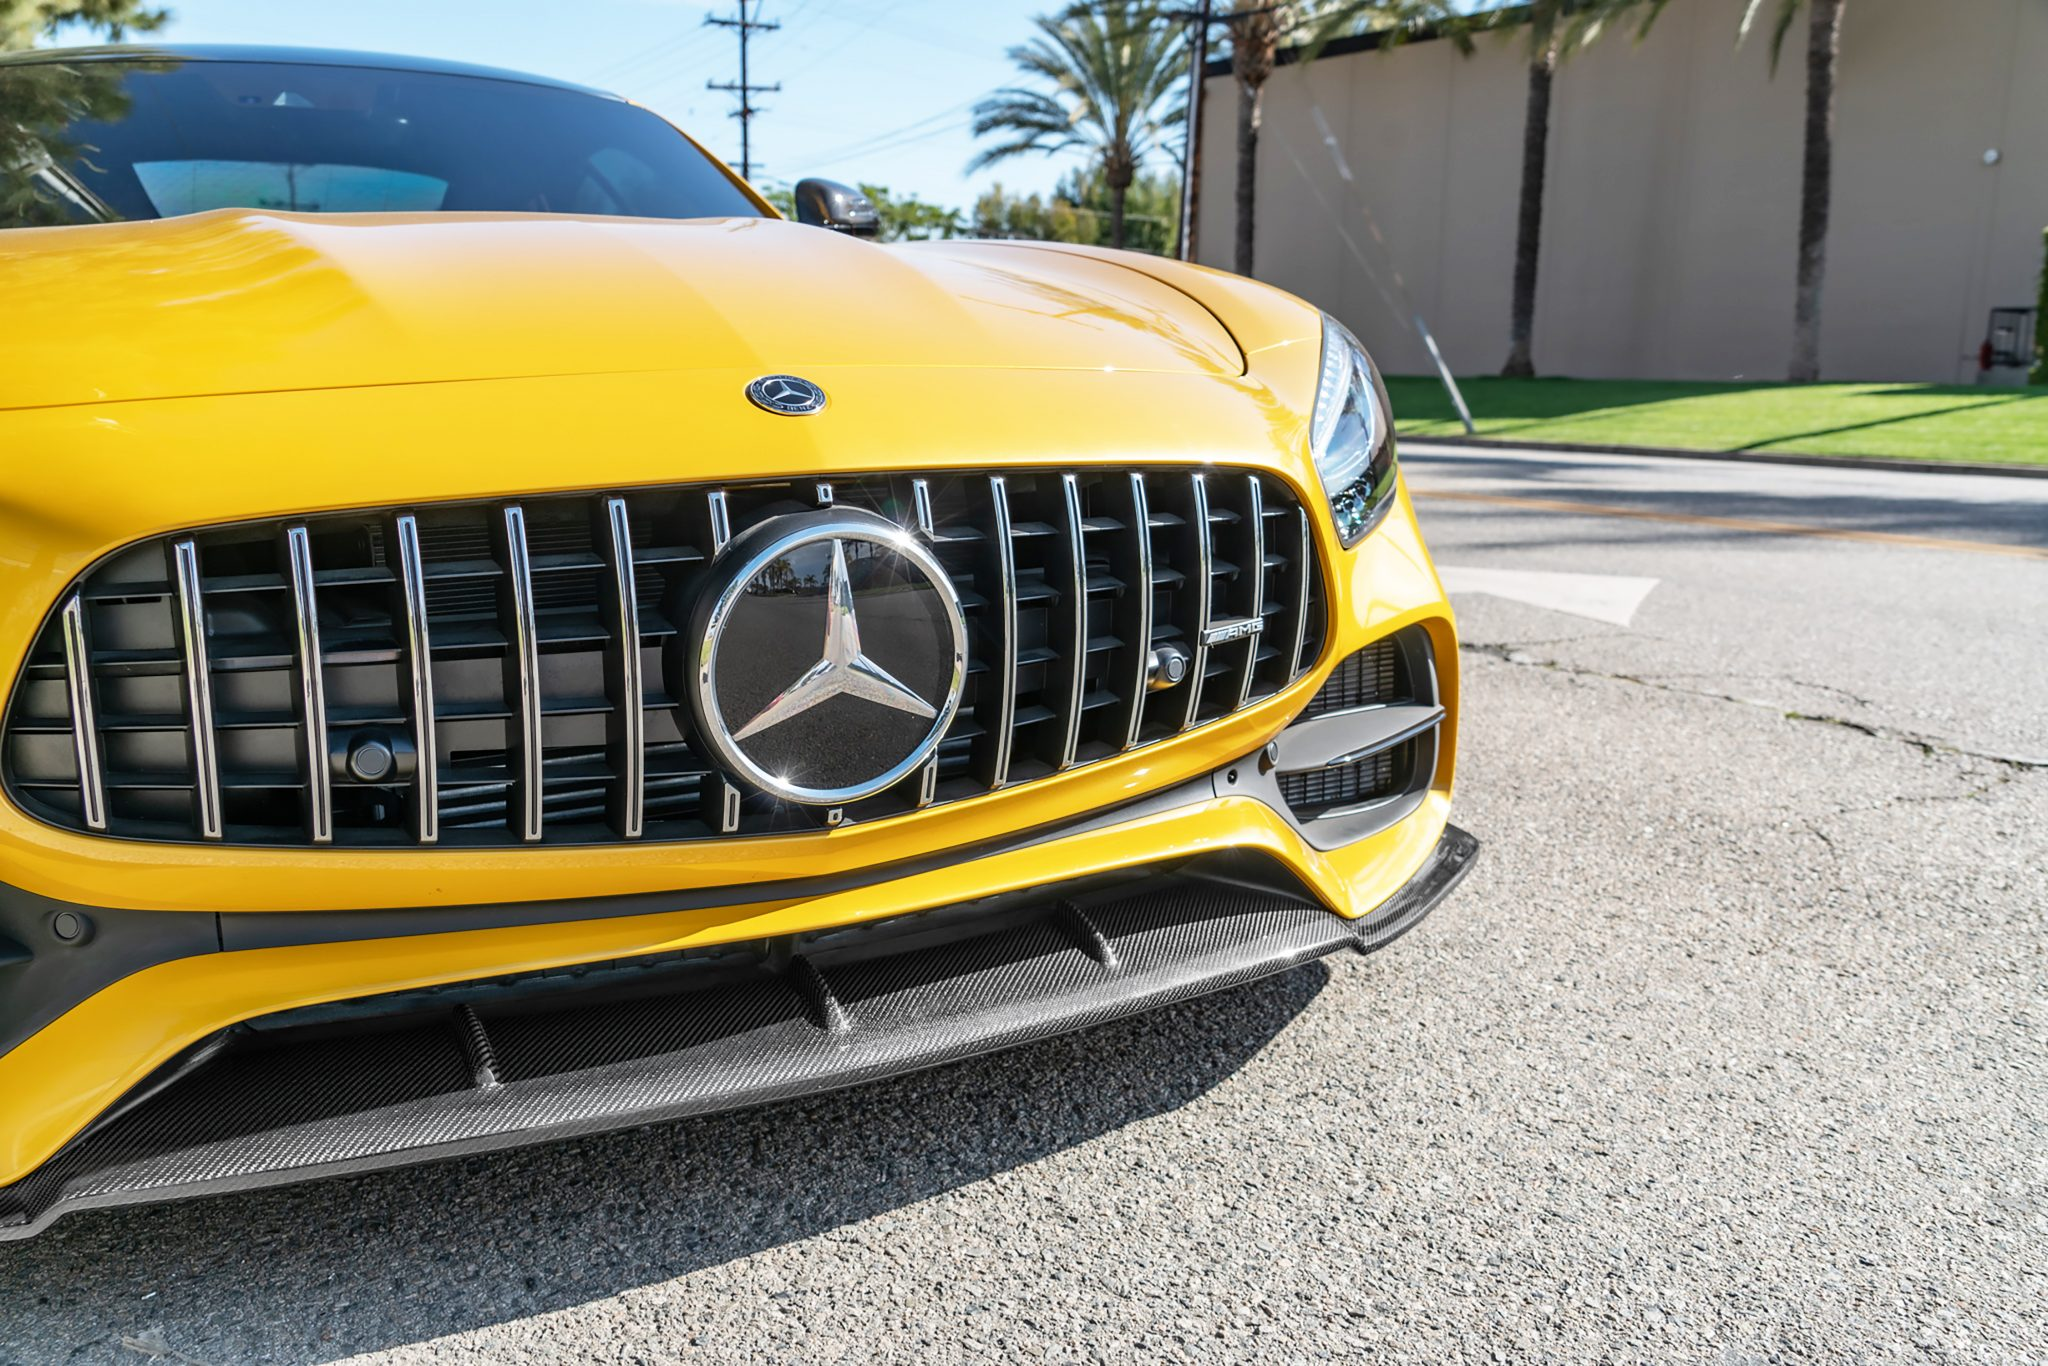 Big Fin Diffuser for a Mercedes W204 C63 AMG - RW Carbons